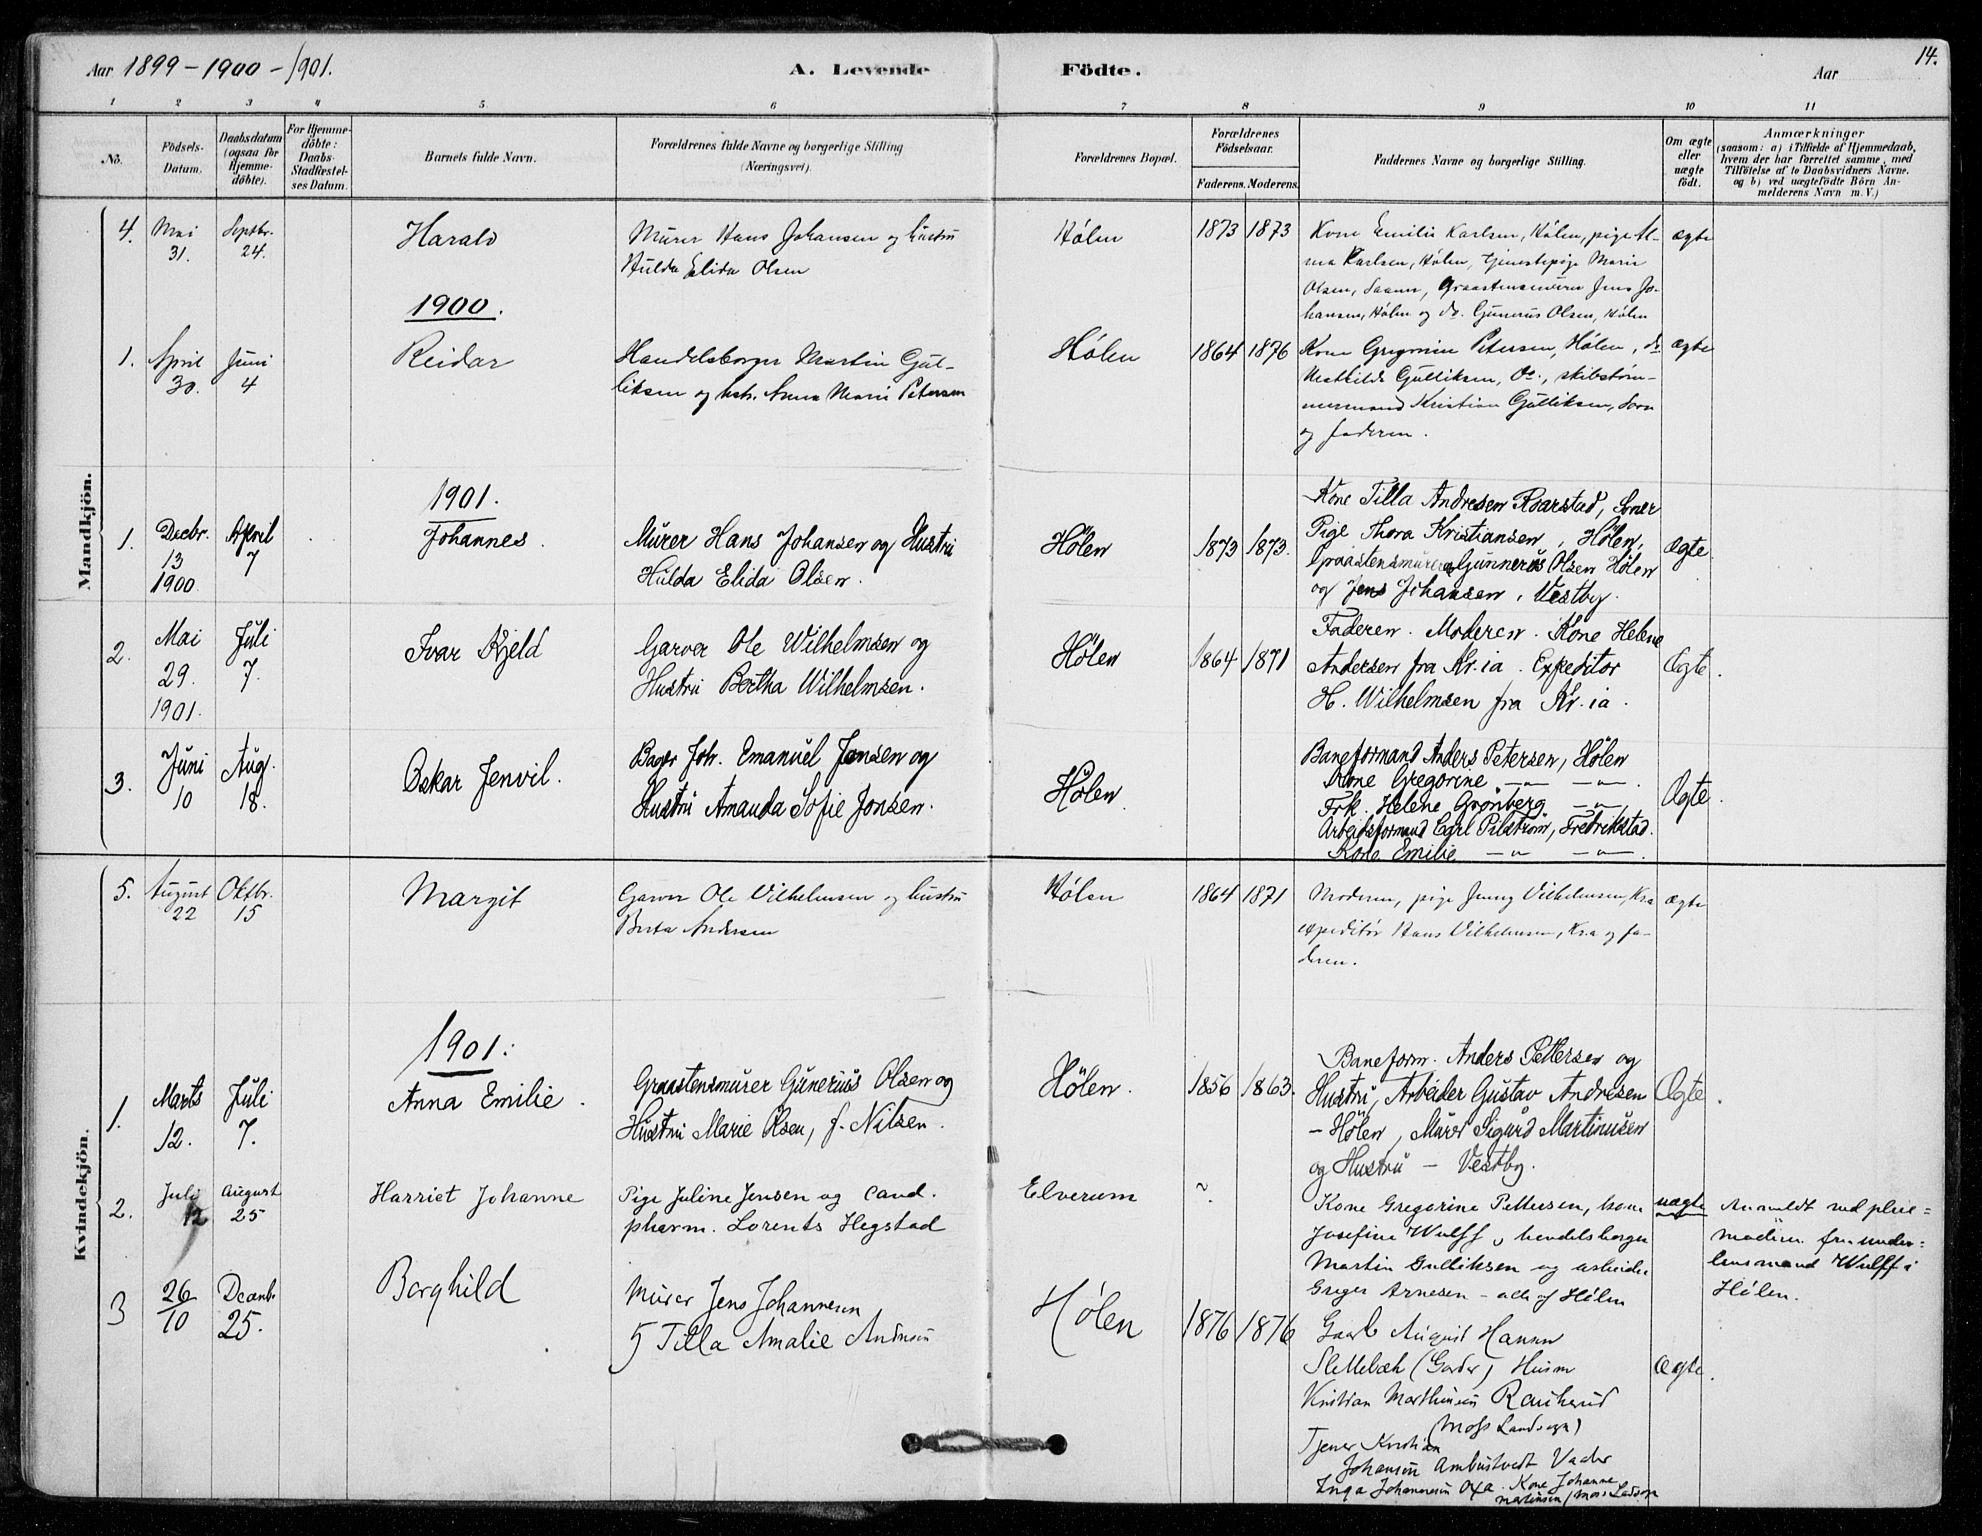 SAO, Vestby prestekontor Kirkebøker, F/Fe/L0001: Ministerialbok nr. V 1, 1878-1931, s. 14